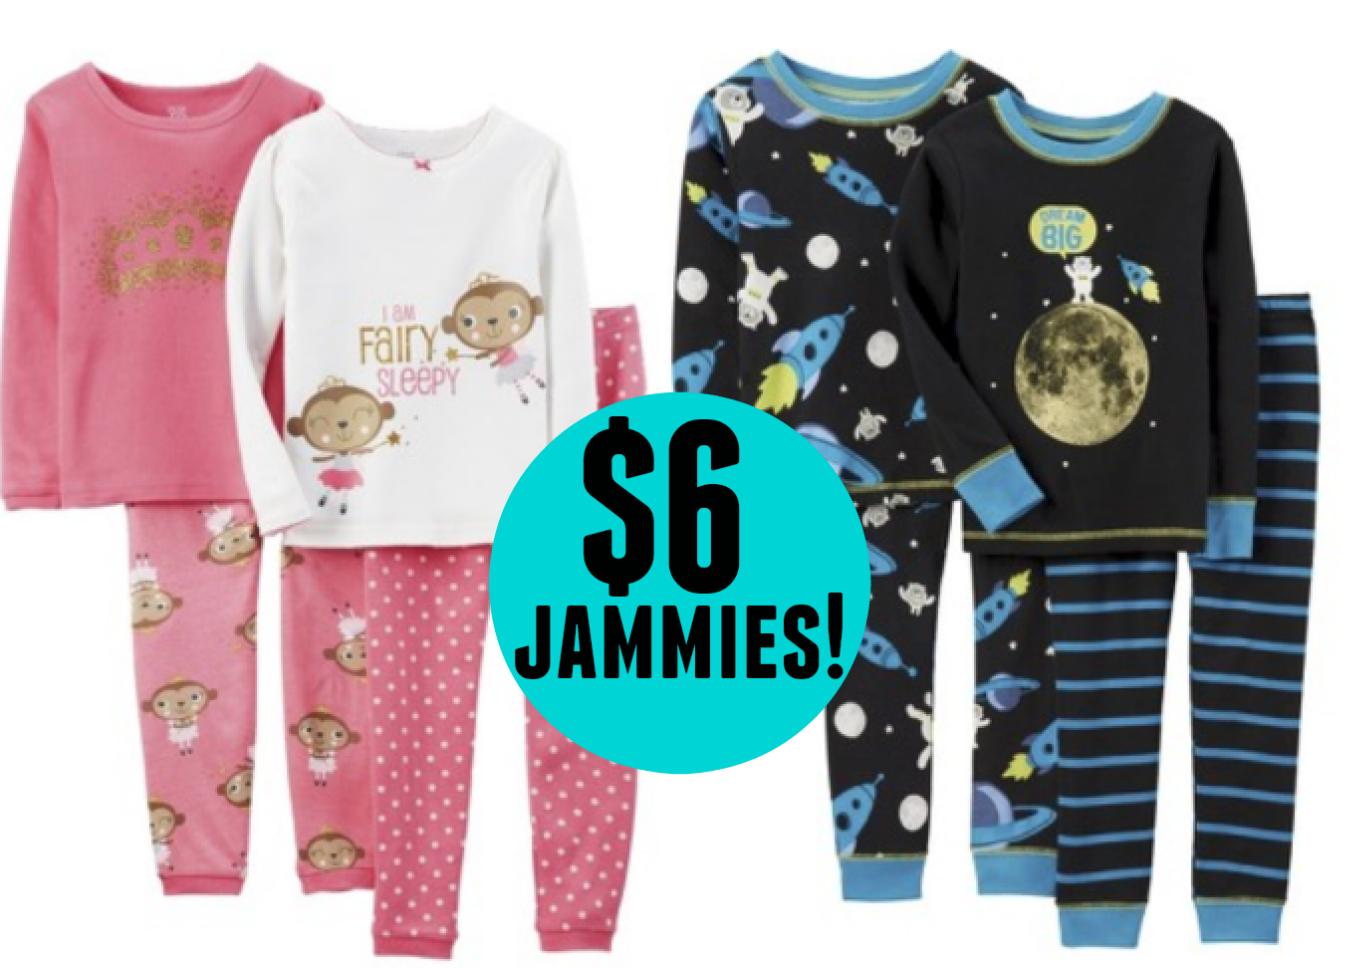 http://www.thebinderladies.com/2014/10/targetcom-2-pack-carters-pajama-sets-as.html#.VFKJbL7duyM